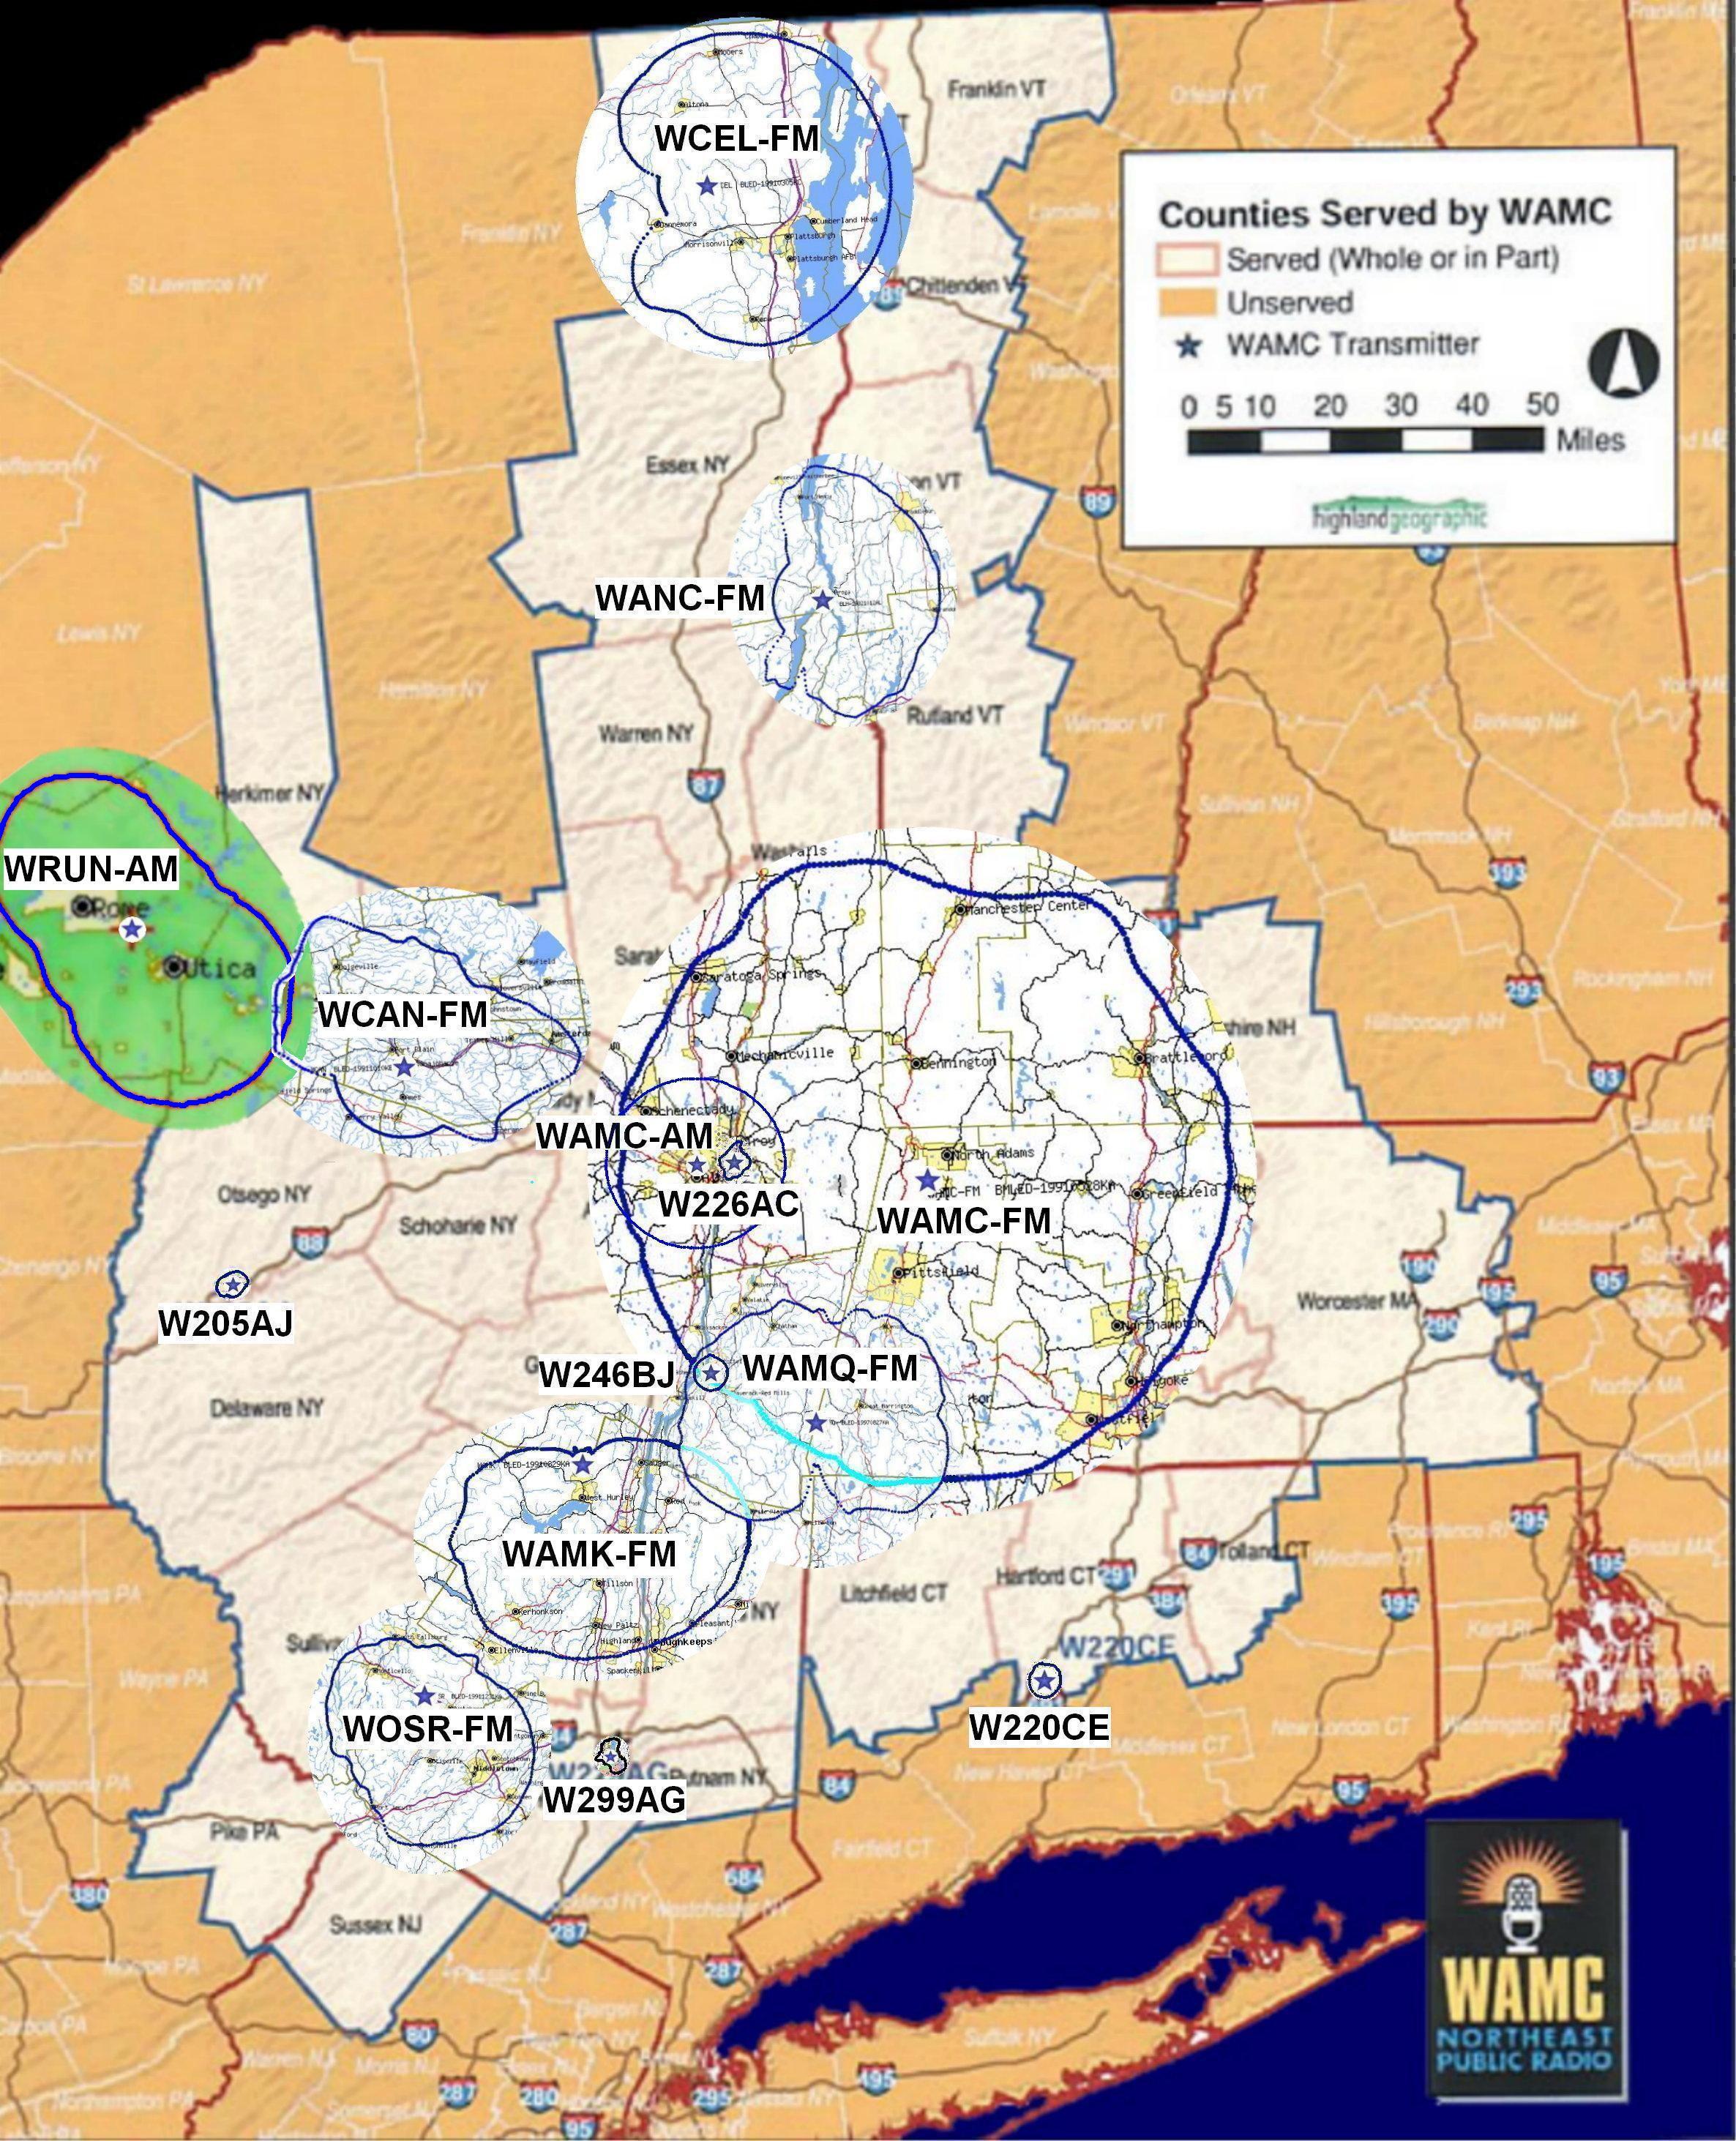 Erp Site Map: STATIONS, TRANSLATORS, WATTAGE